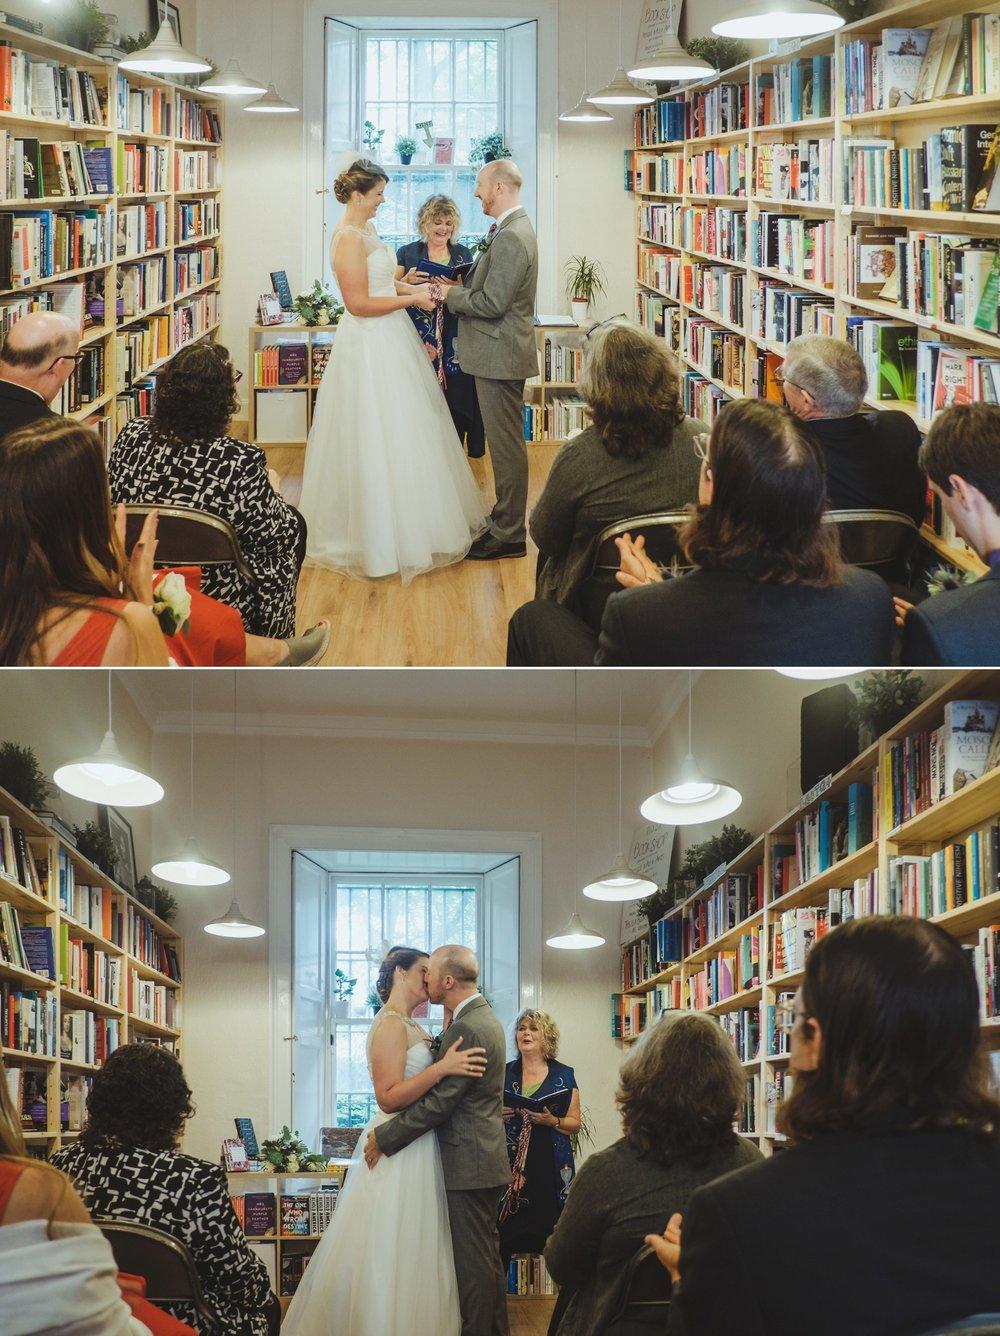 Angela___Andy_s_Edinburgh_elopement_by_Barry_Forshaw_0154.jpg